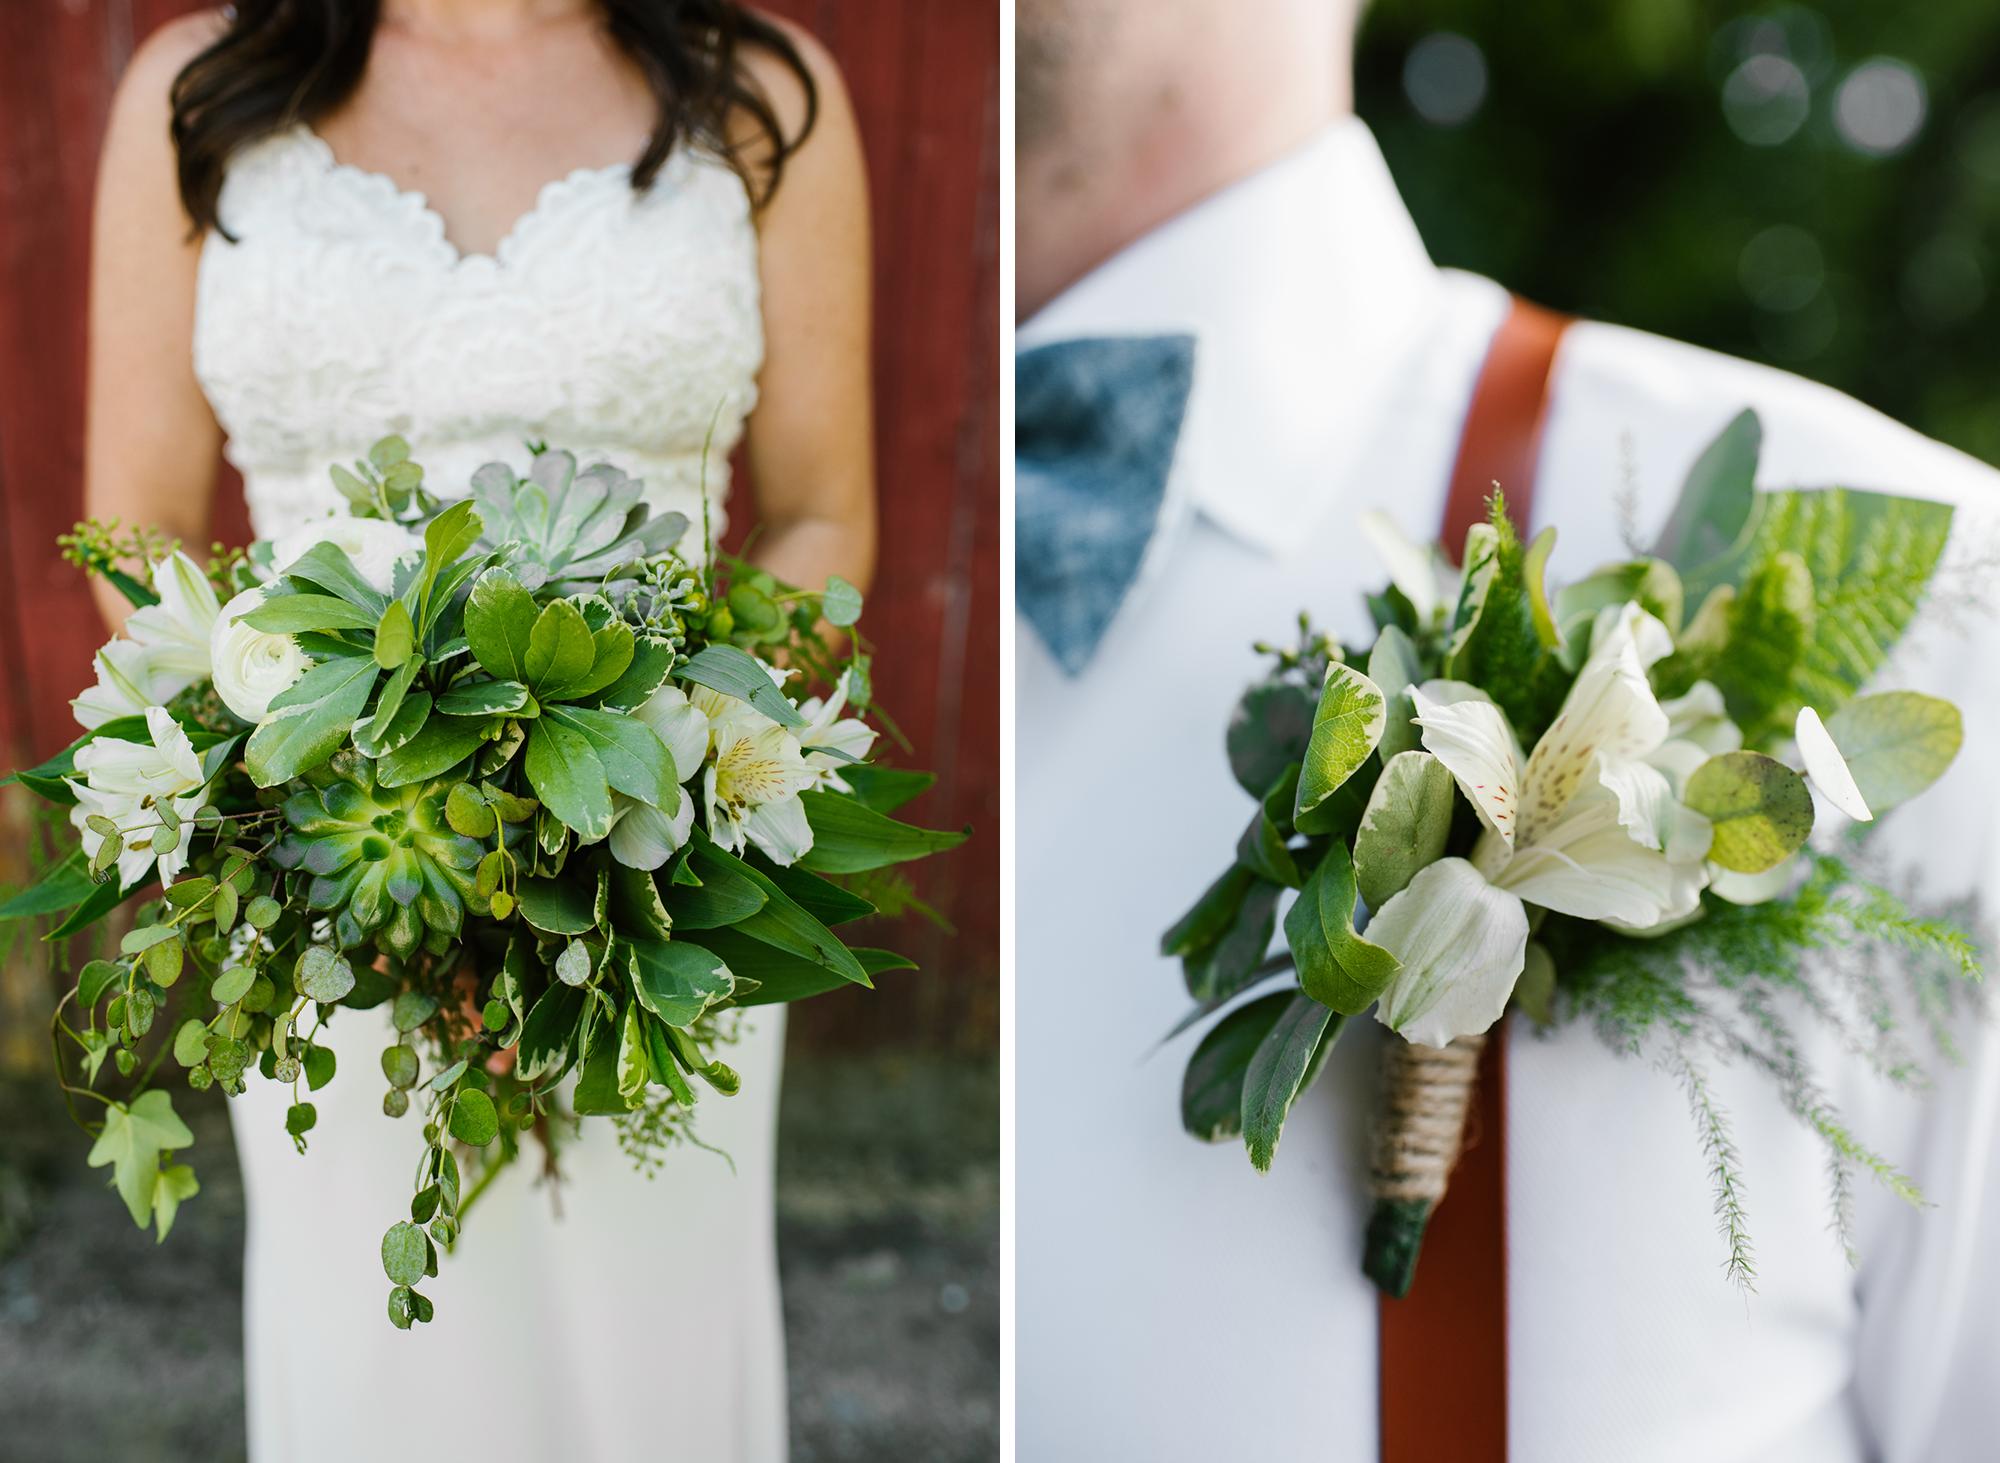 flower-details-michigan-wedding-photographer-sydney-marie.png